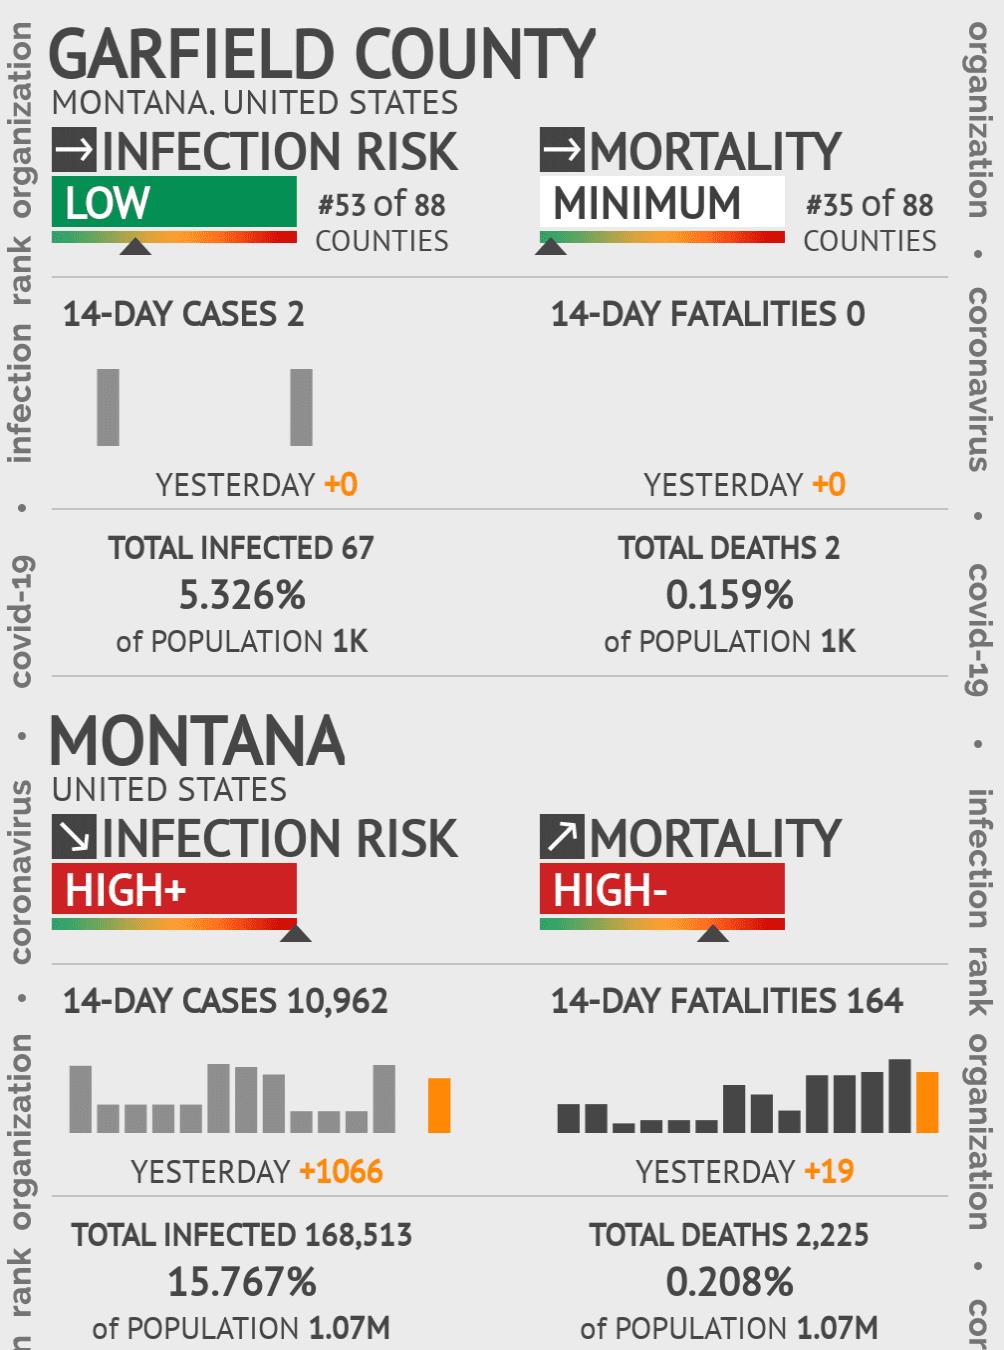 Garfield County Coronavirus Covid-19 Risk of Infection on December 18, 2020